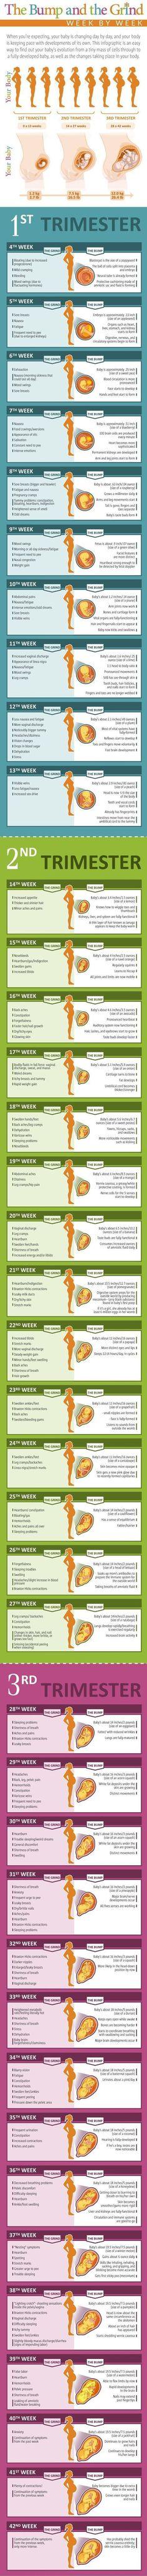 Pregnancy Week by Week Chart - Fun - - Schwanger - Pregnant Tips Pregnancy Chart, Pregnancy Info, Pregnancy Health, Pregnancy Weeks, Pregnancy Timeline, Pregnancy Stages, Pregnancy Trimester Chart, Pregnancy Facts, Early Pregnancy Signs